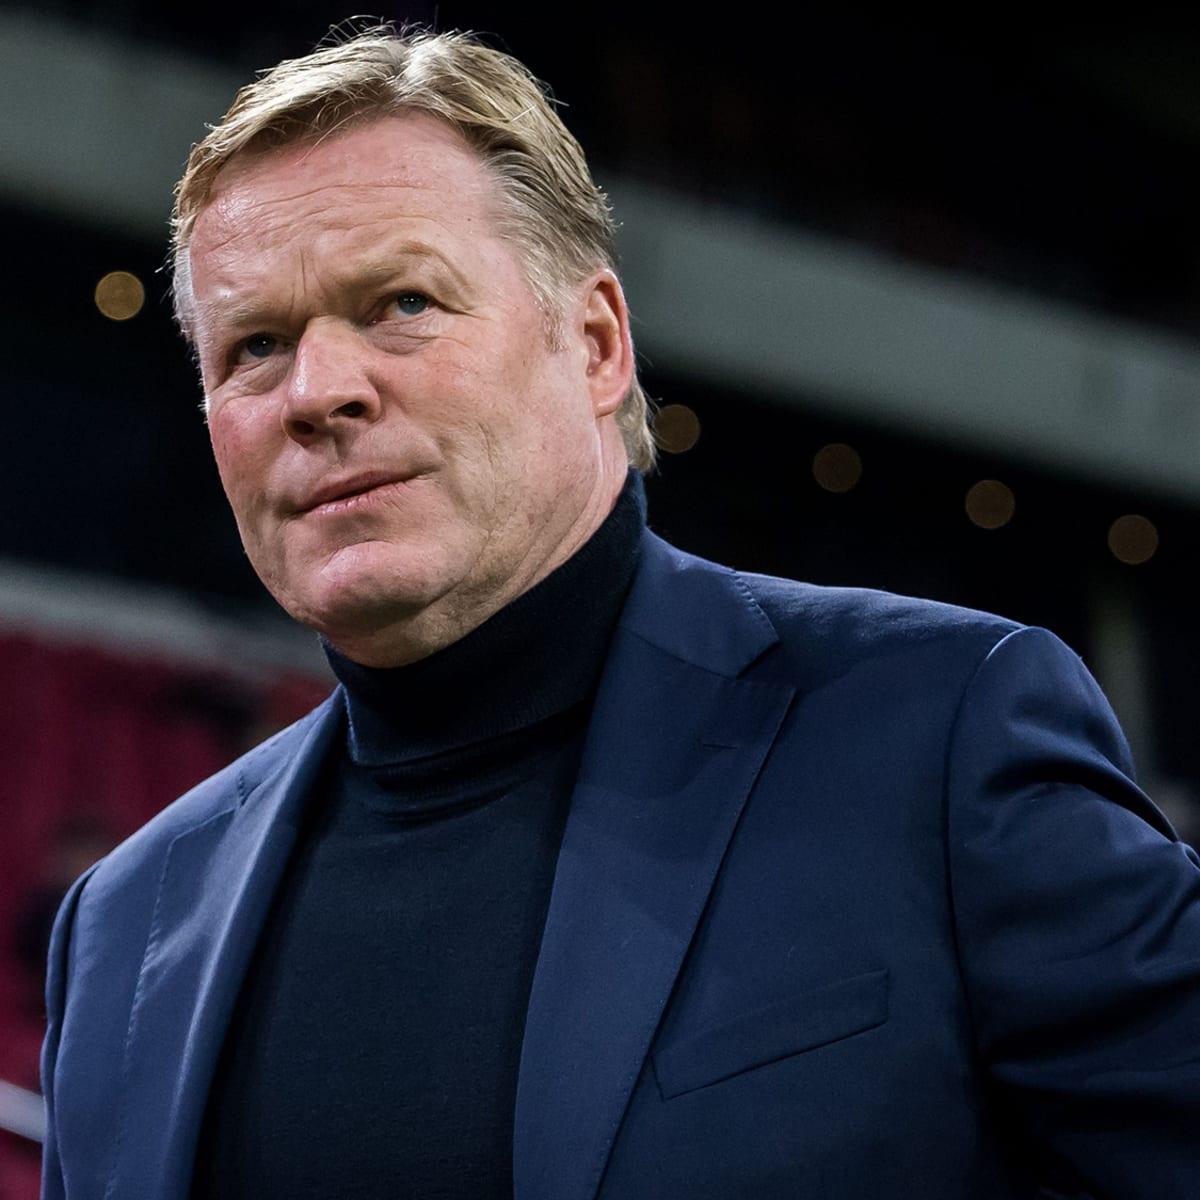 Ronald Koeman, Barcelona reunite, but new coach has a huge job - Sports Illustrated